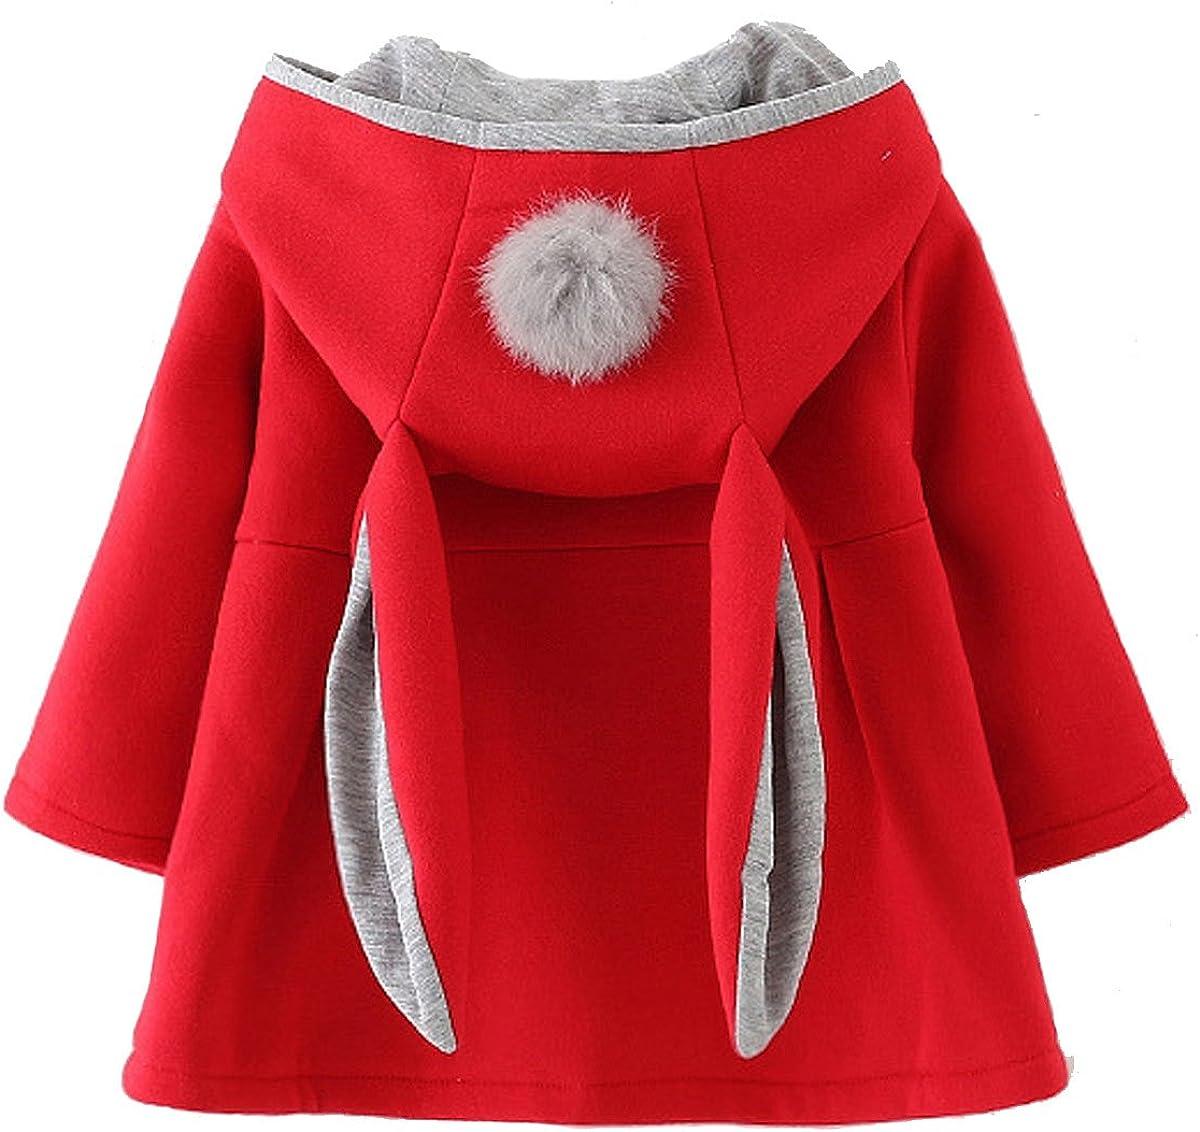 Waprincess 2017 Baby Girls Toddler Kids Winter Big Ears Hoodie Jackets Outerwear Coats